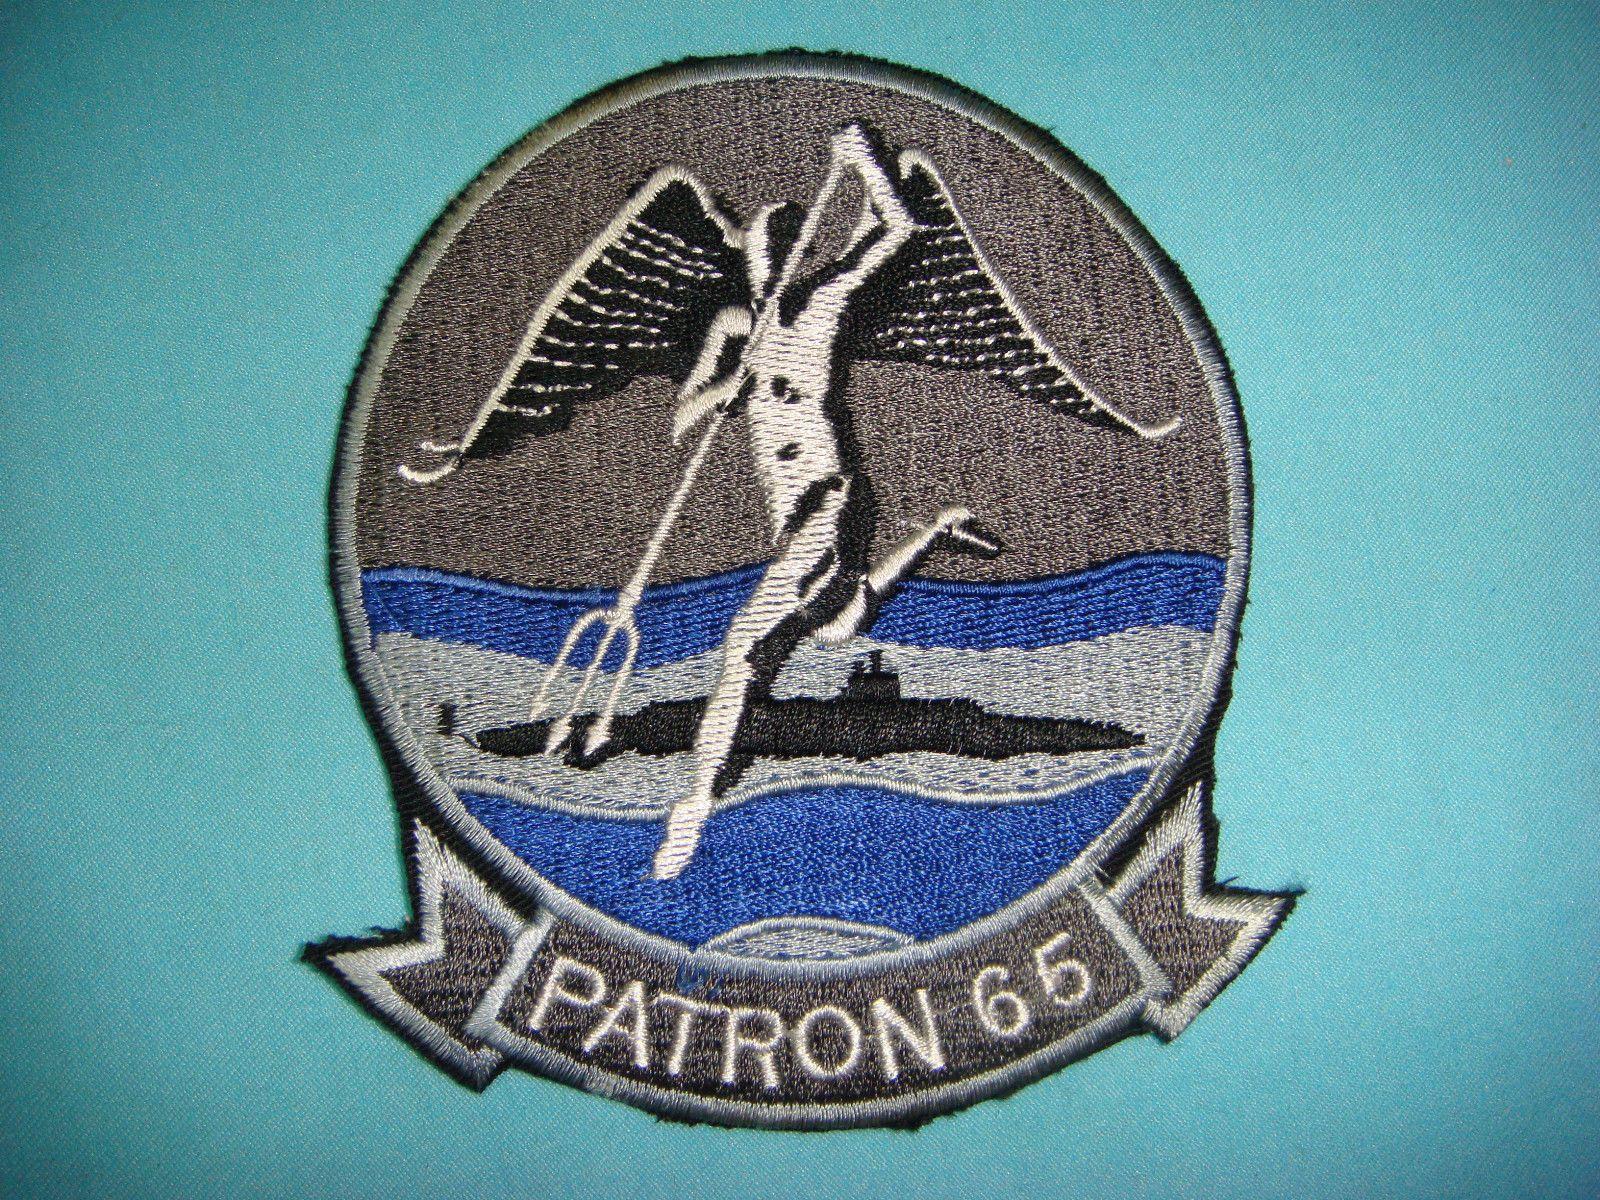 Vietnam war patch us navy patrol squadron vp 65 trident design vietnam war patch us navy patrol squadron vp 65 trident biocorpaavc